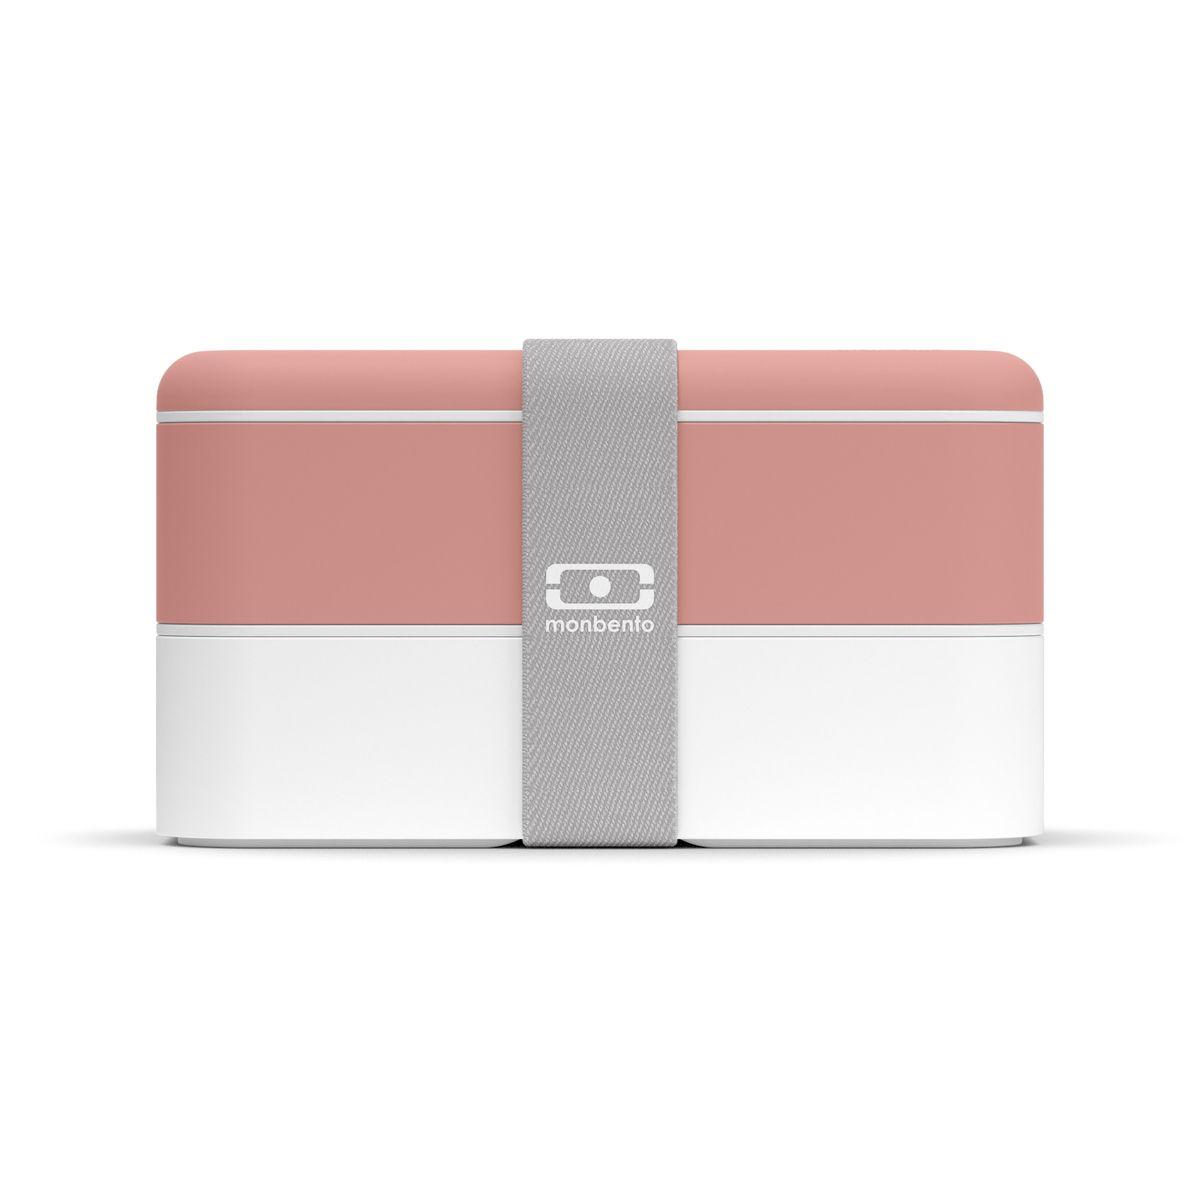 Lunch box MB original rose flamingo 1L - Monbento